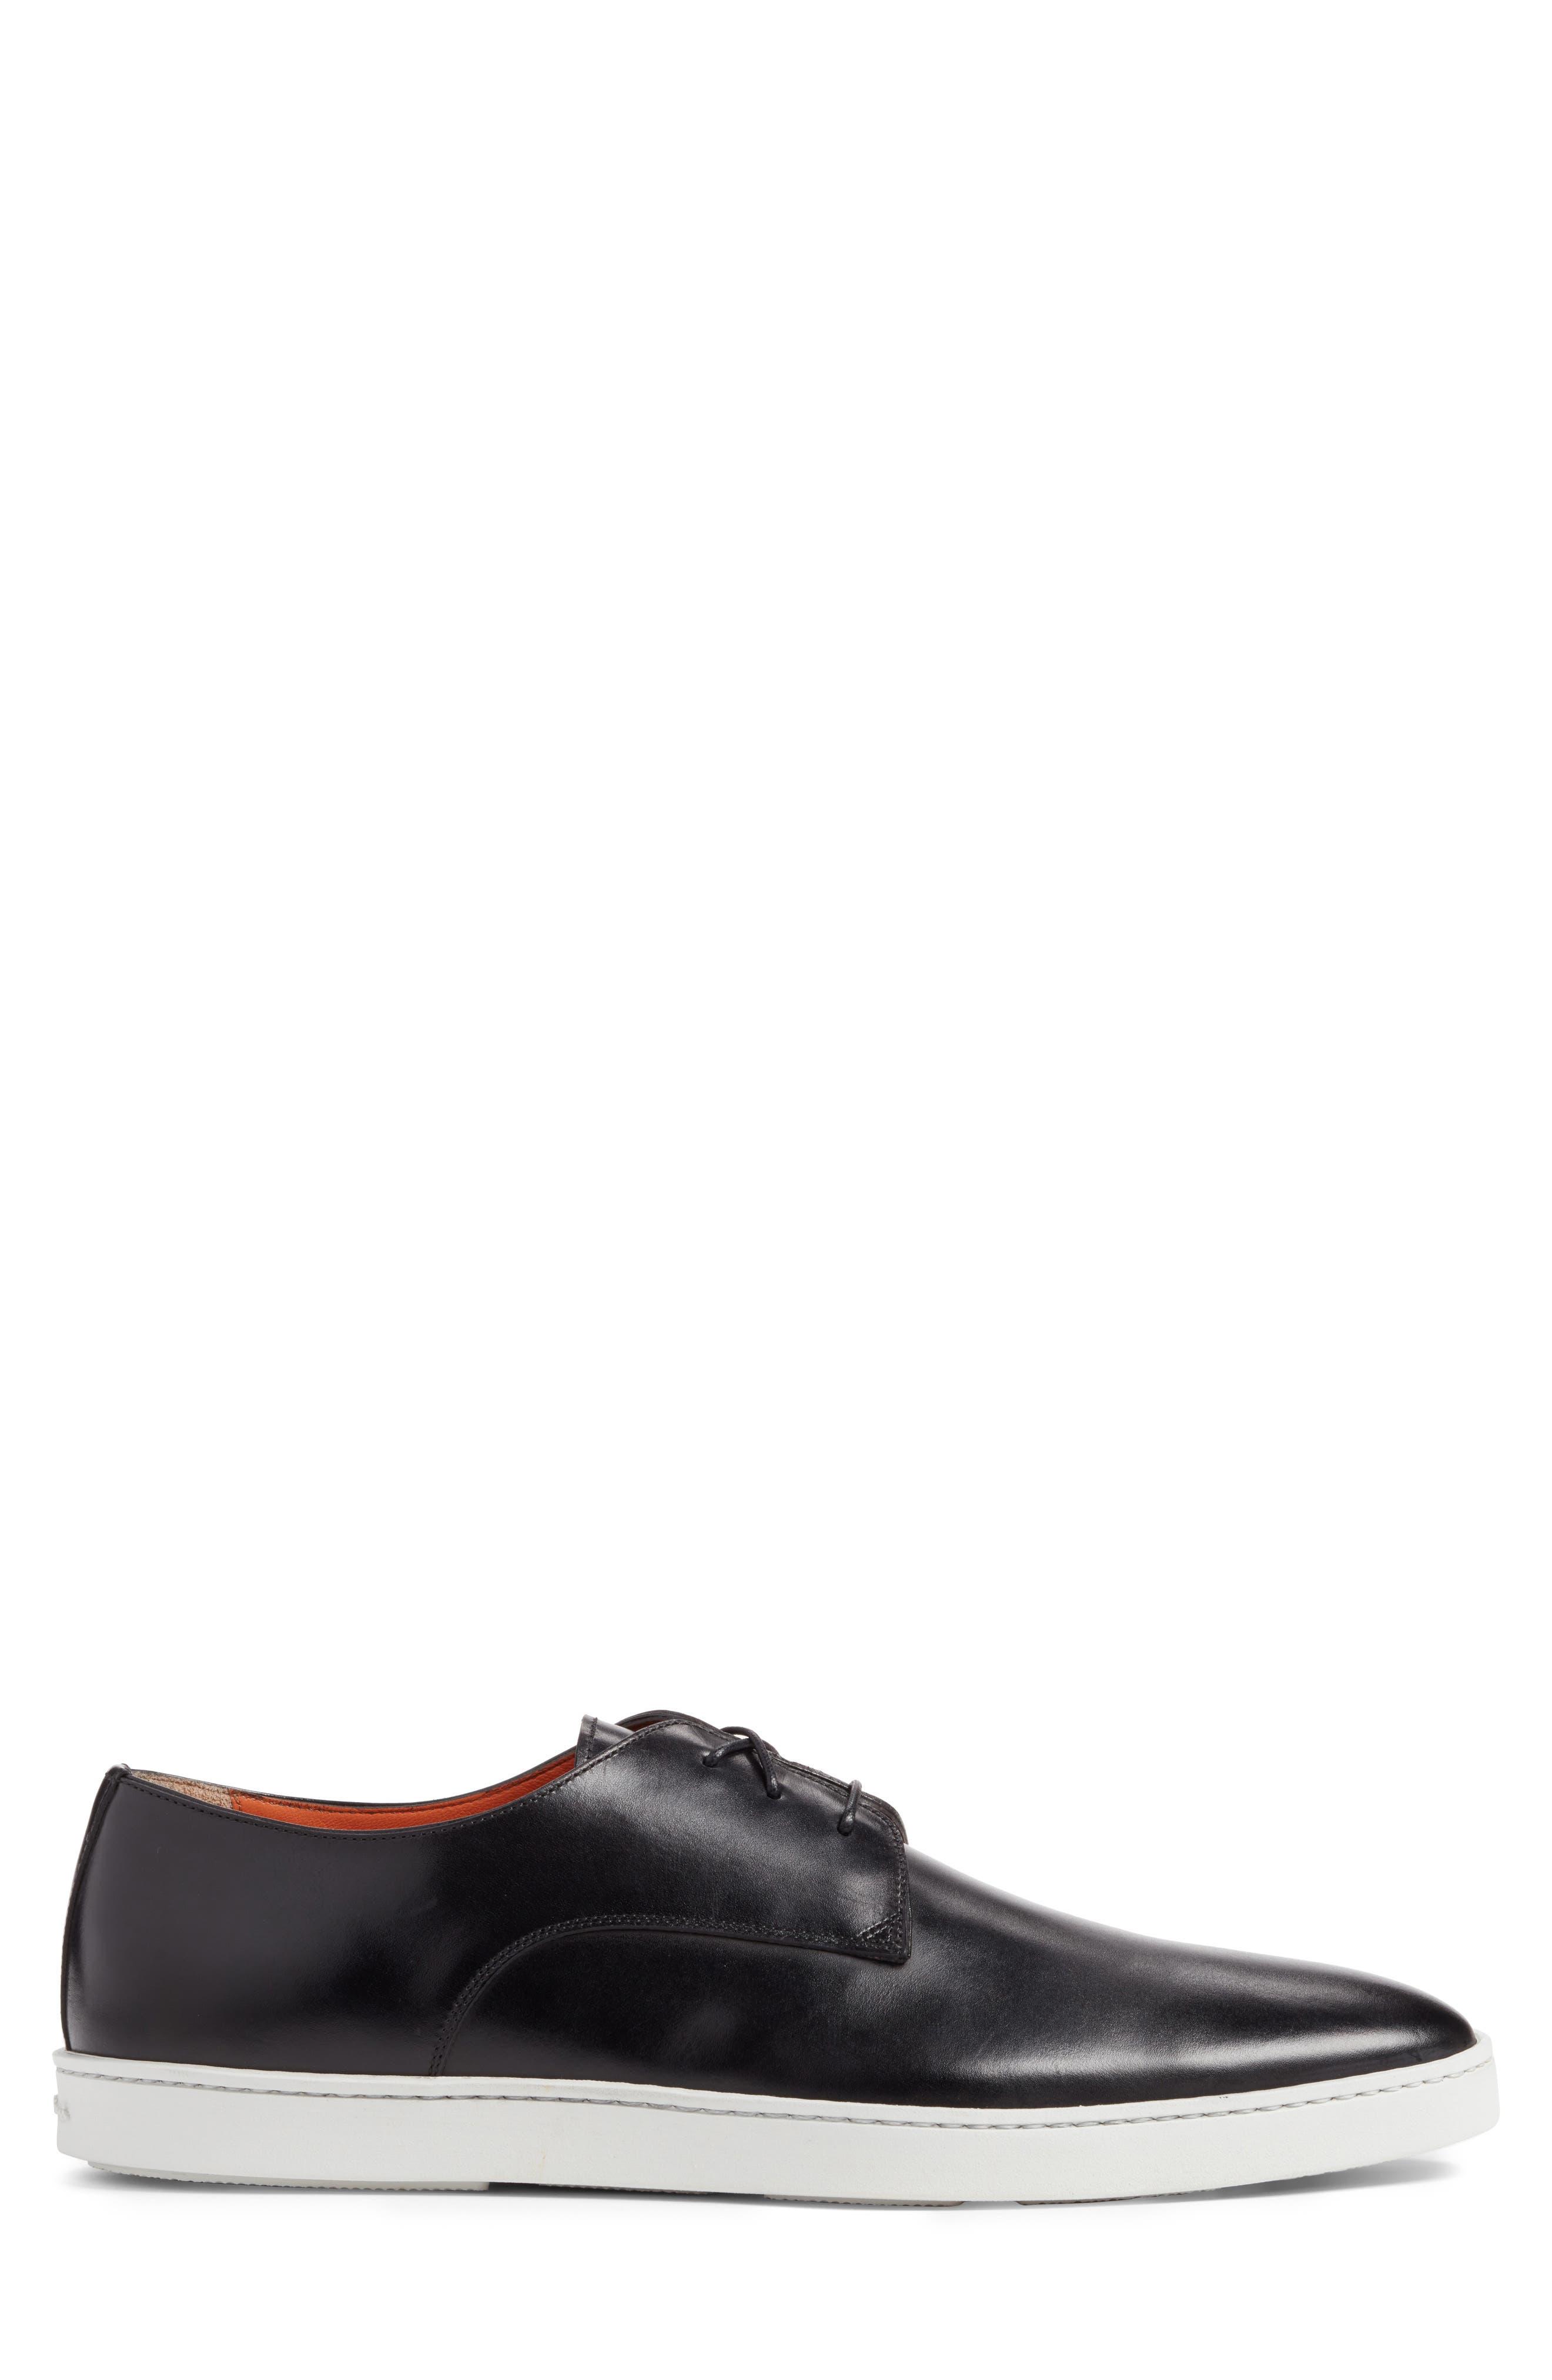 SANTONI, Doyle Sneaker, Alternate thumbnail 3, color, BLACK LEATHER